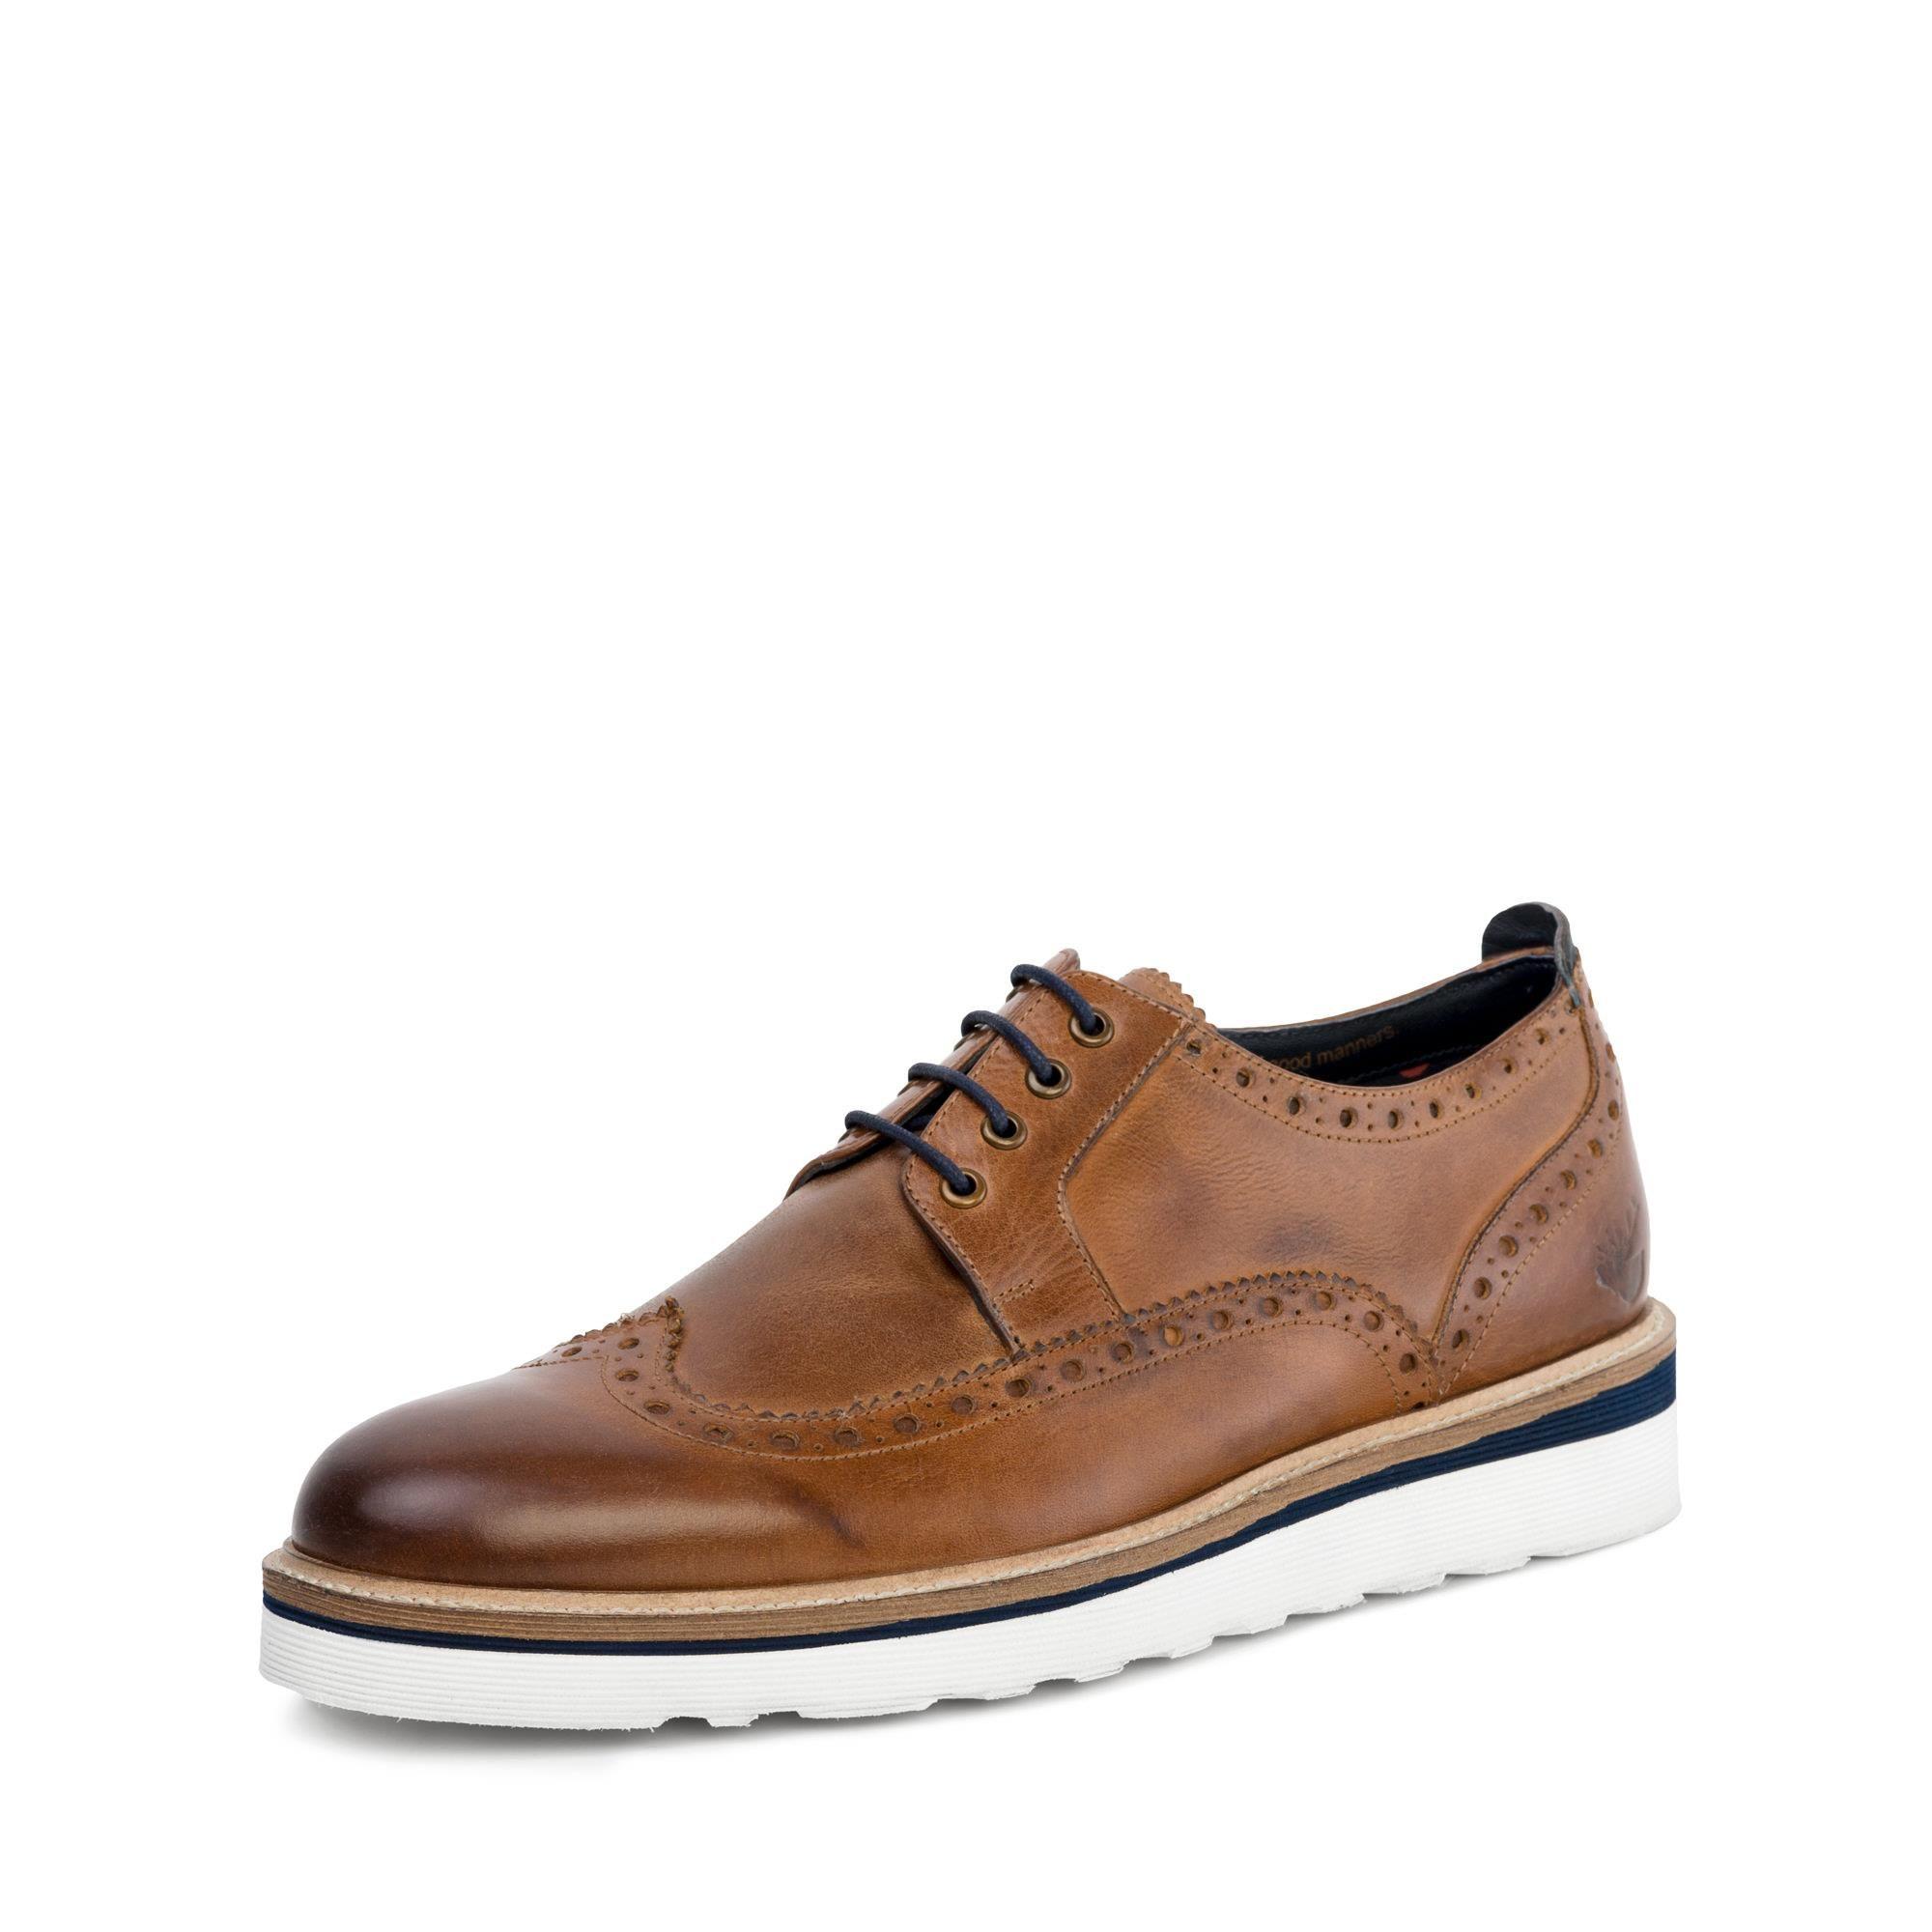 Goodwin Smith Ripley Tan Casual Leather Brogue Shoe